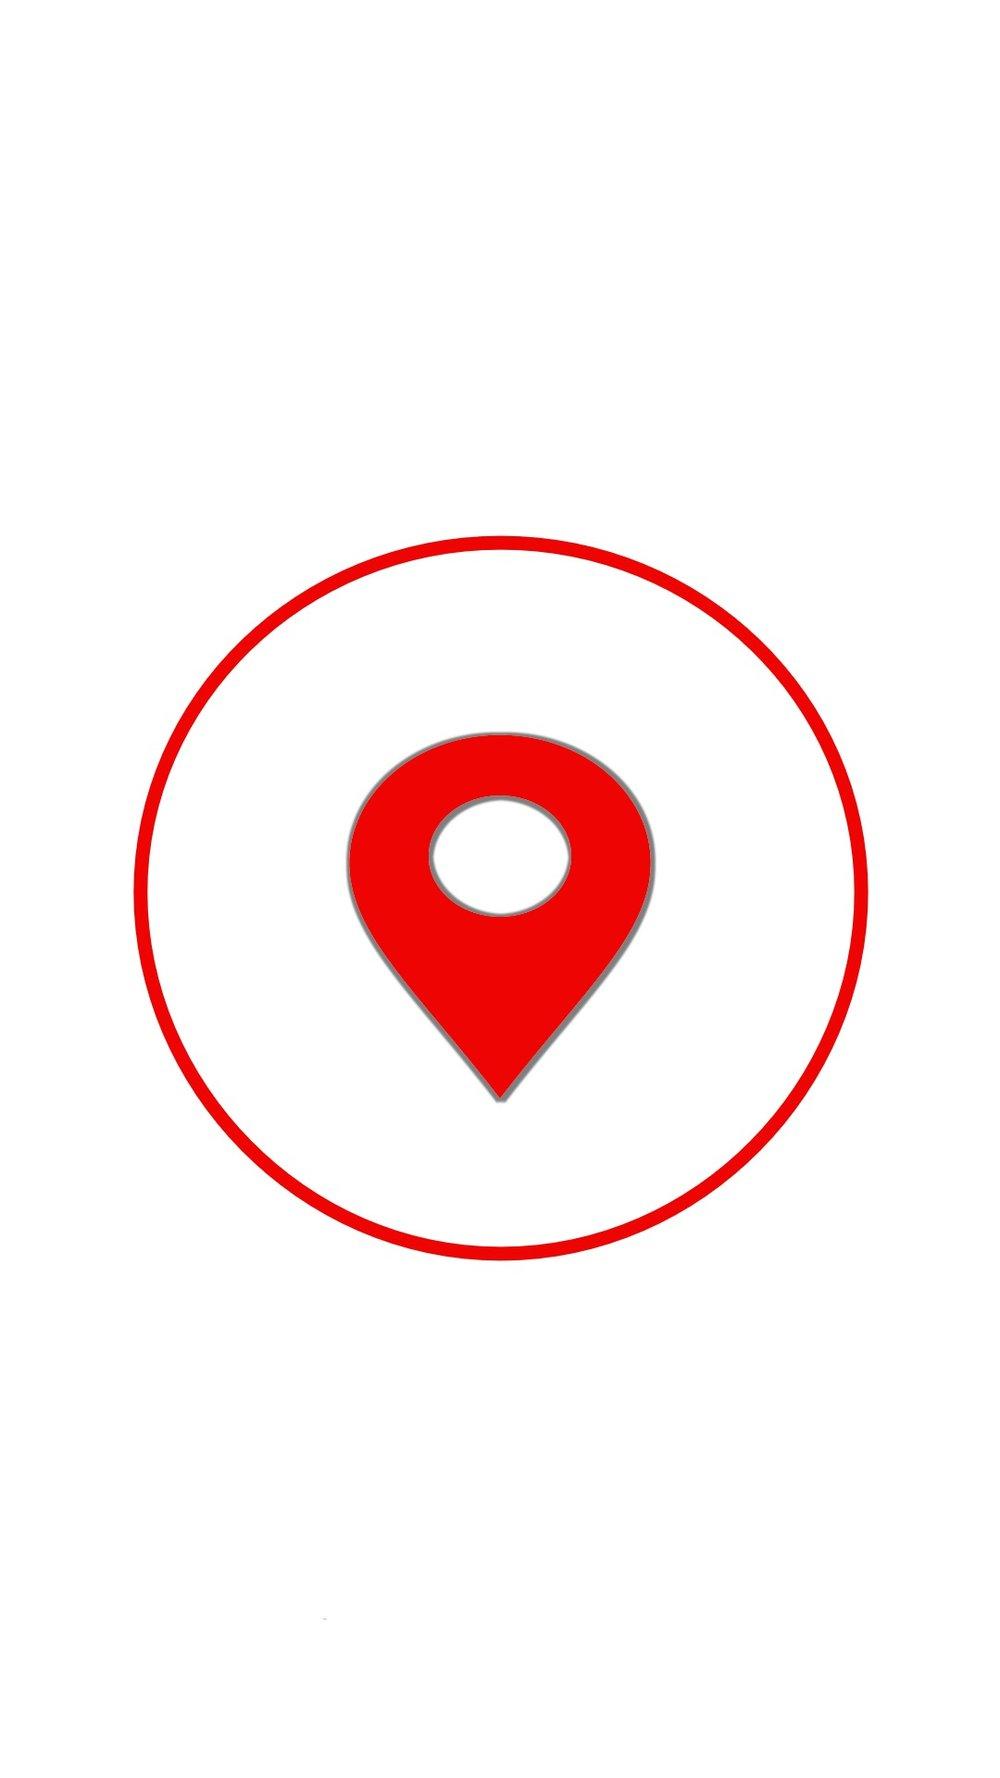 Instagram-cover-location-red-white-lotnotes.com.jpg